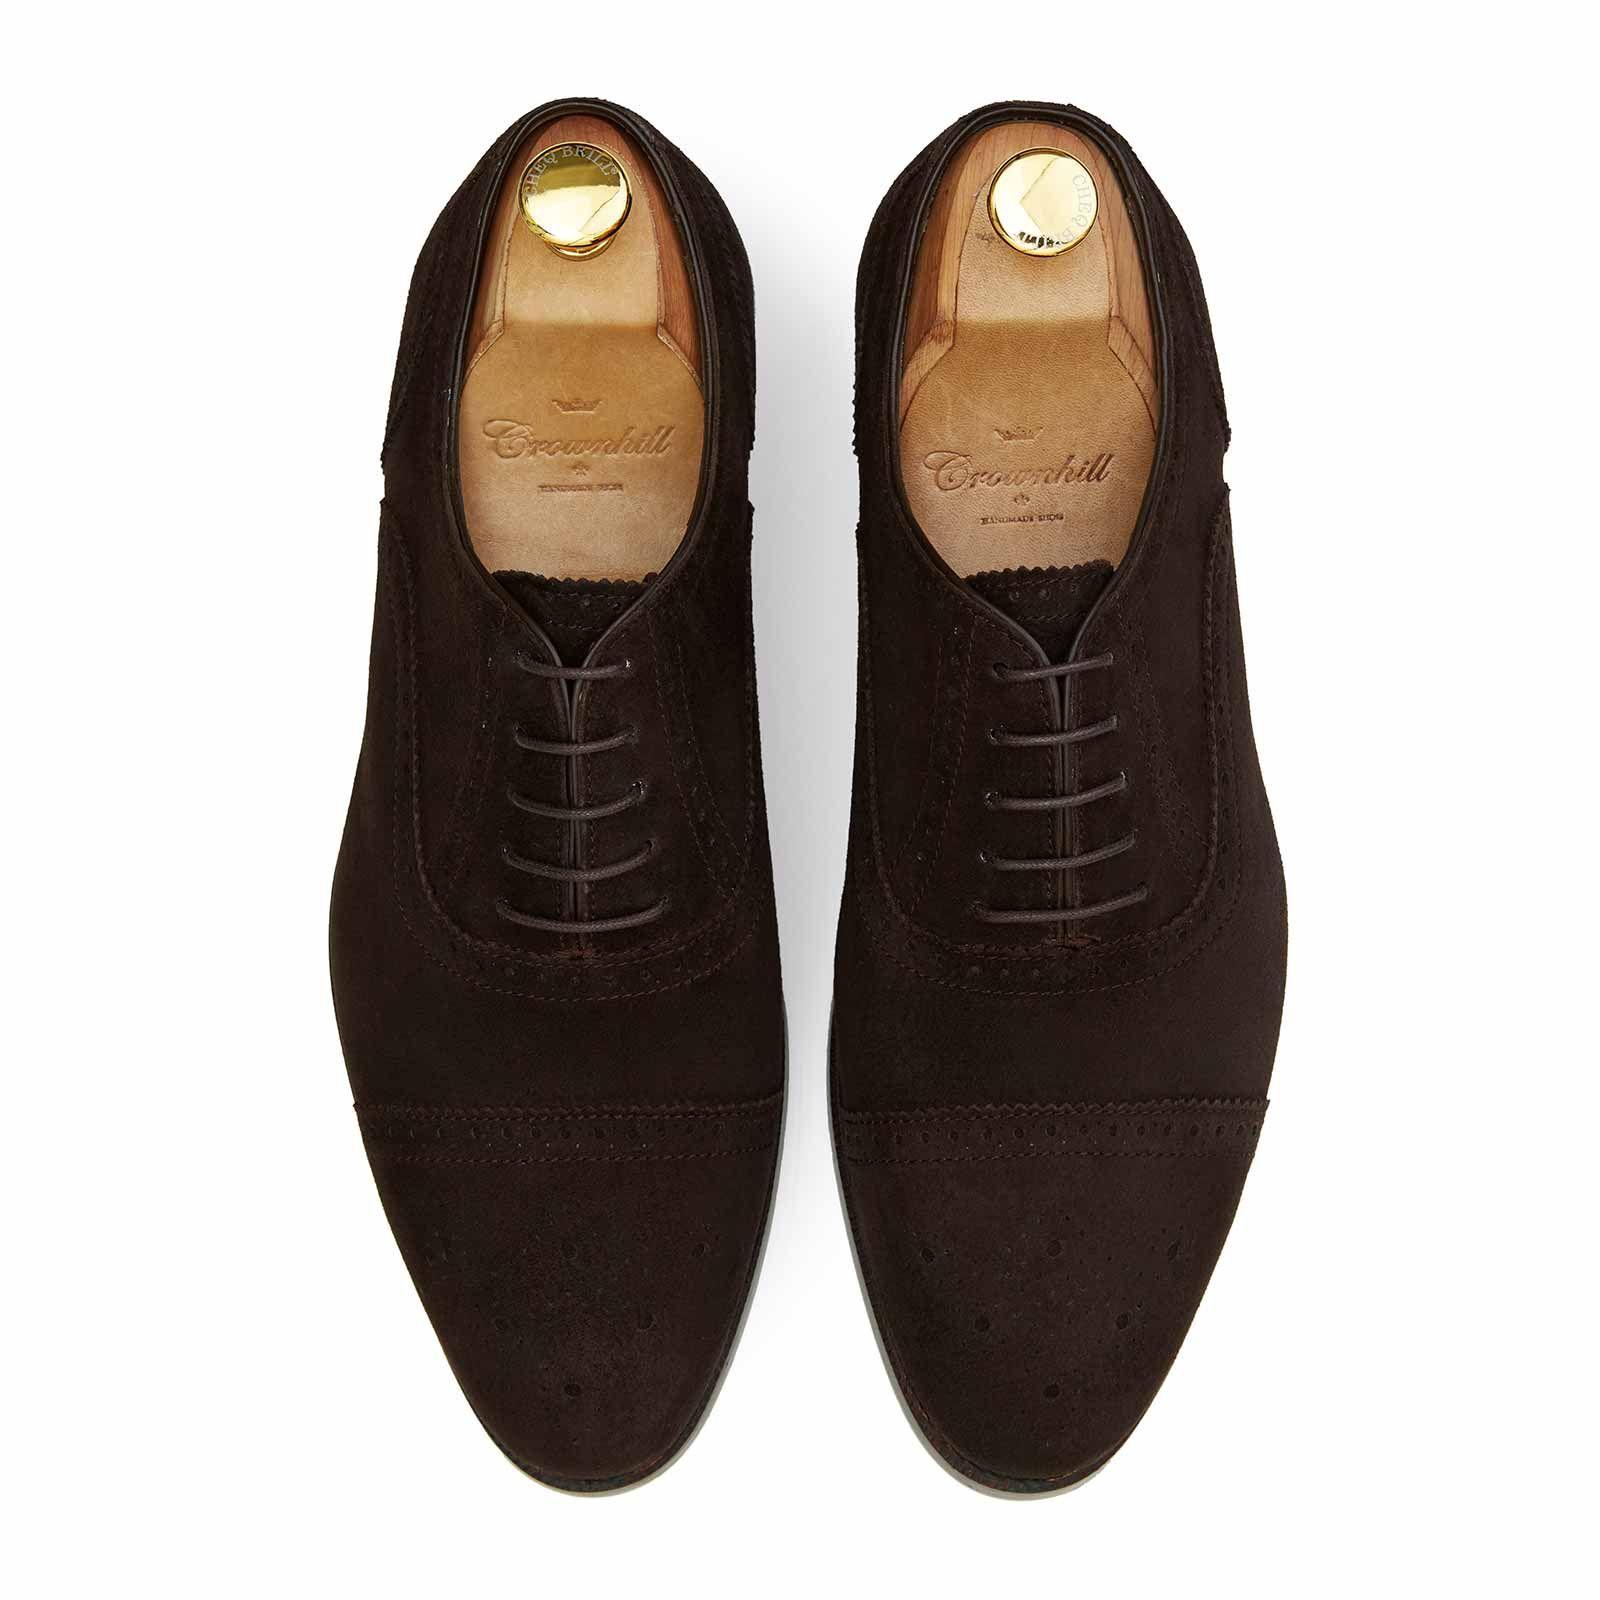 The Delon: Brown Suede Oxford Shoe